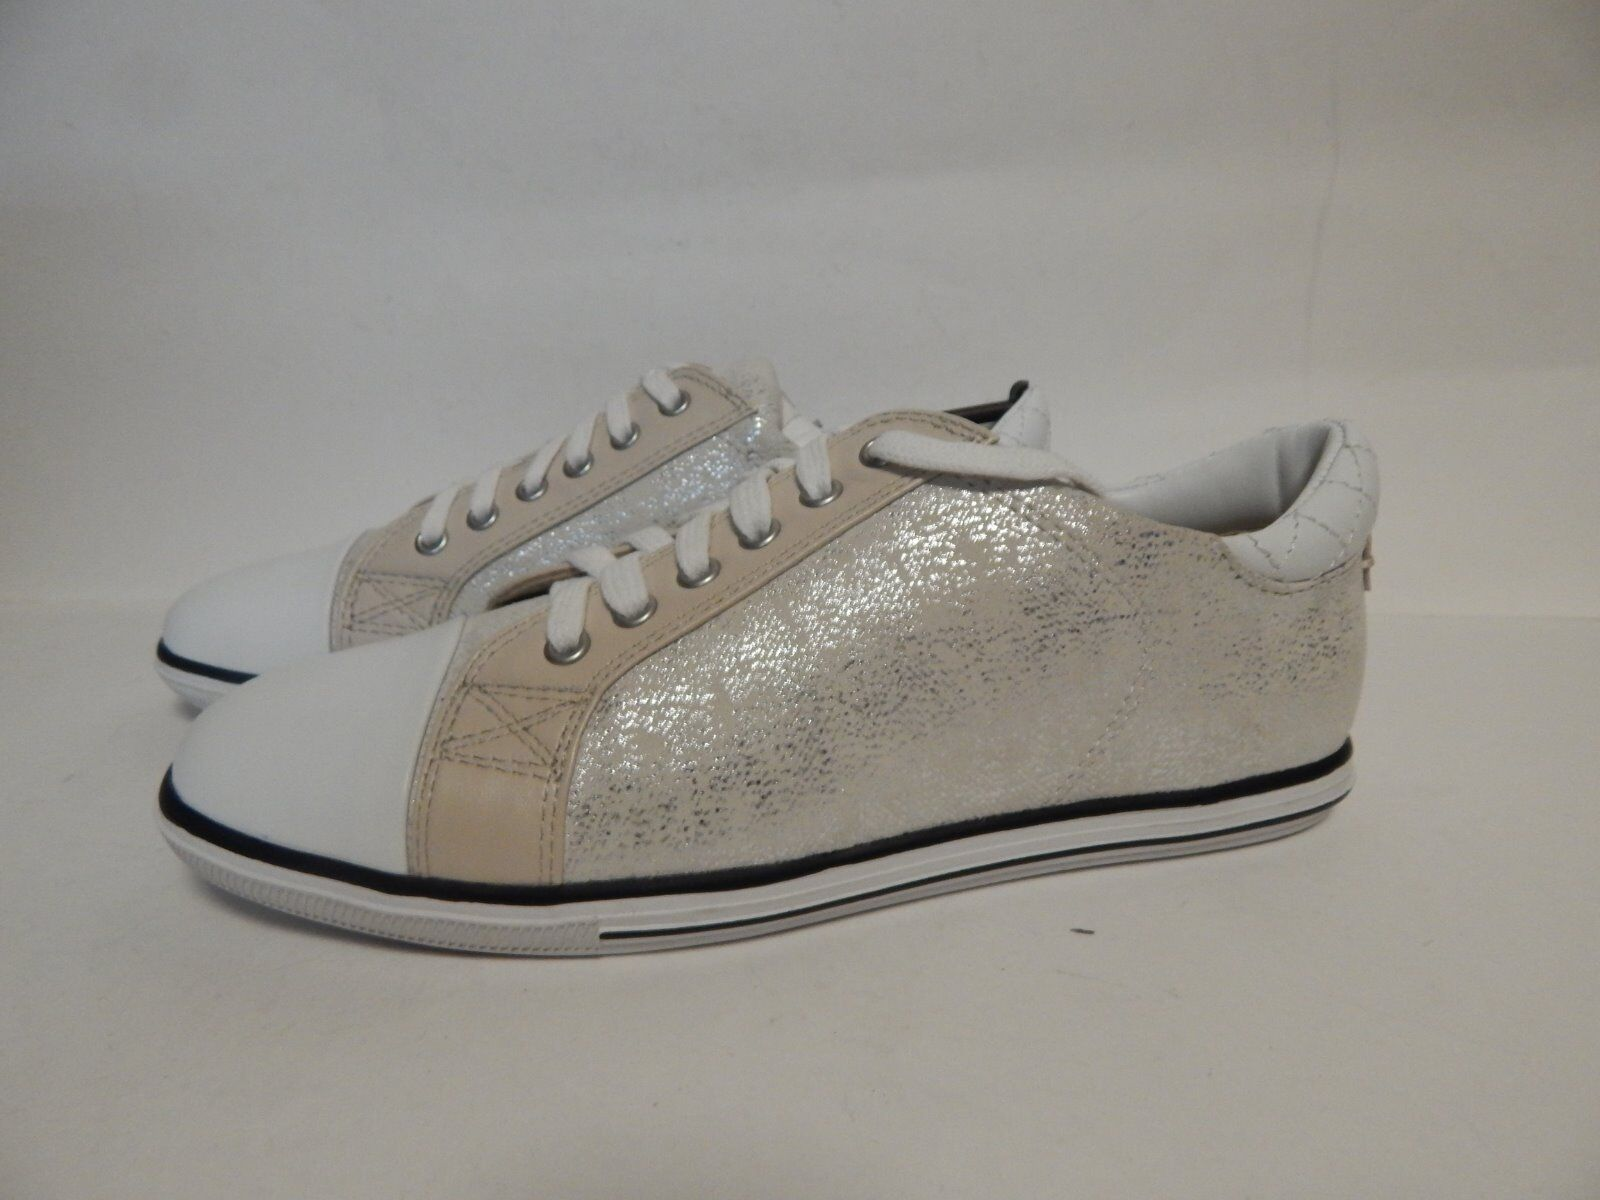 Elie Tahari Dream scarpe da ginnastica 37 US 7 M bianca Bone Argen  New with Box